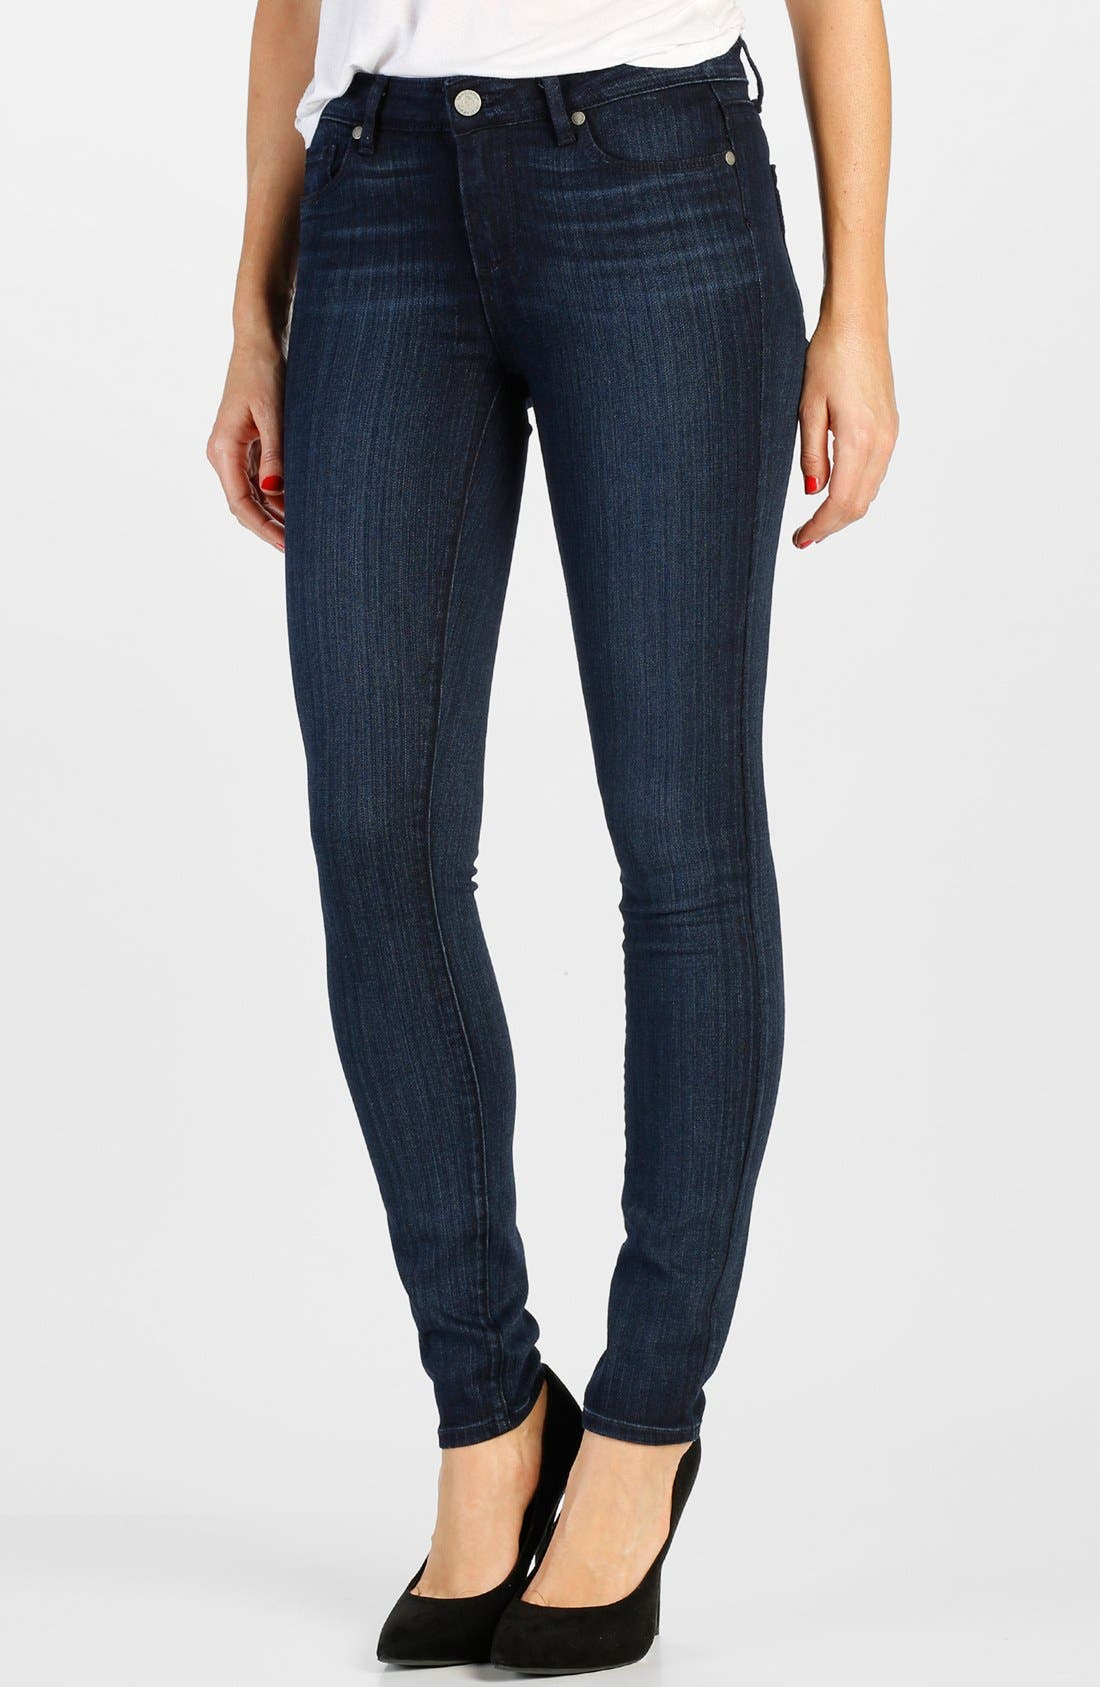 Main Image - Paige Denim 'Transcend - Verdugo' Ultra Skinny Jeans (Georgie)